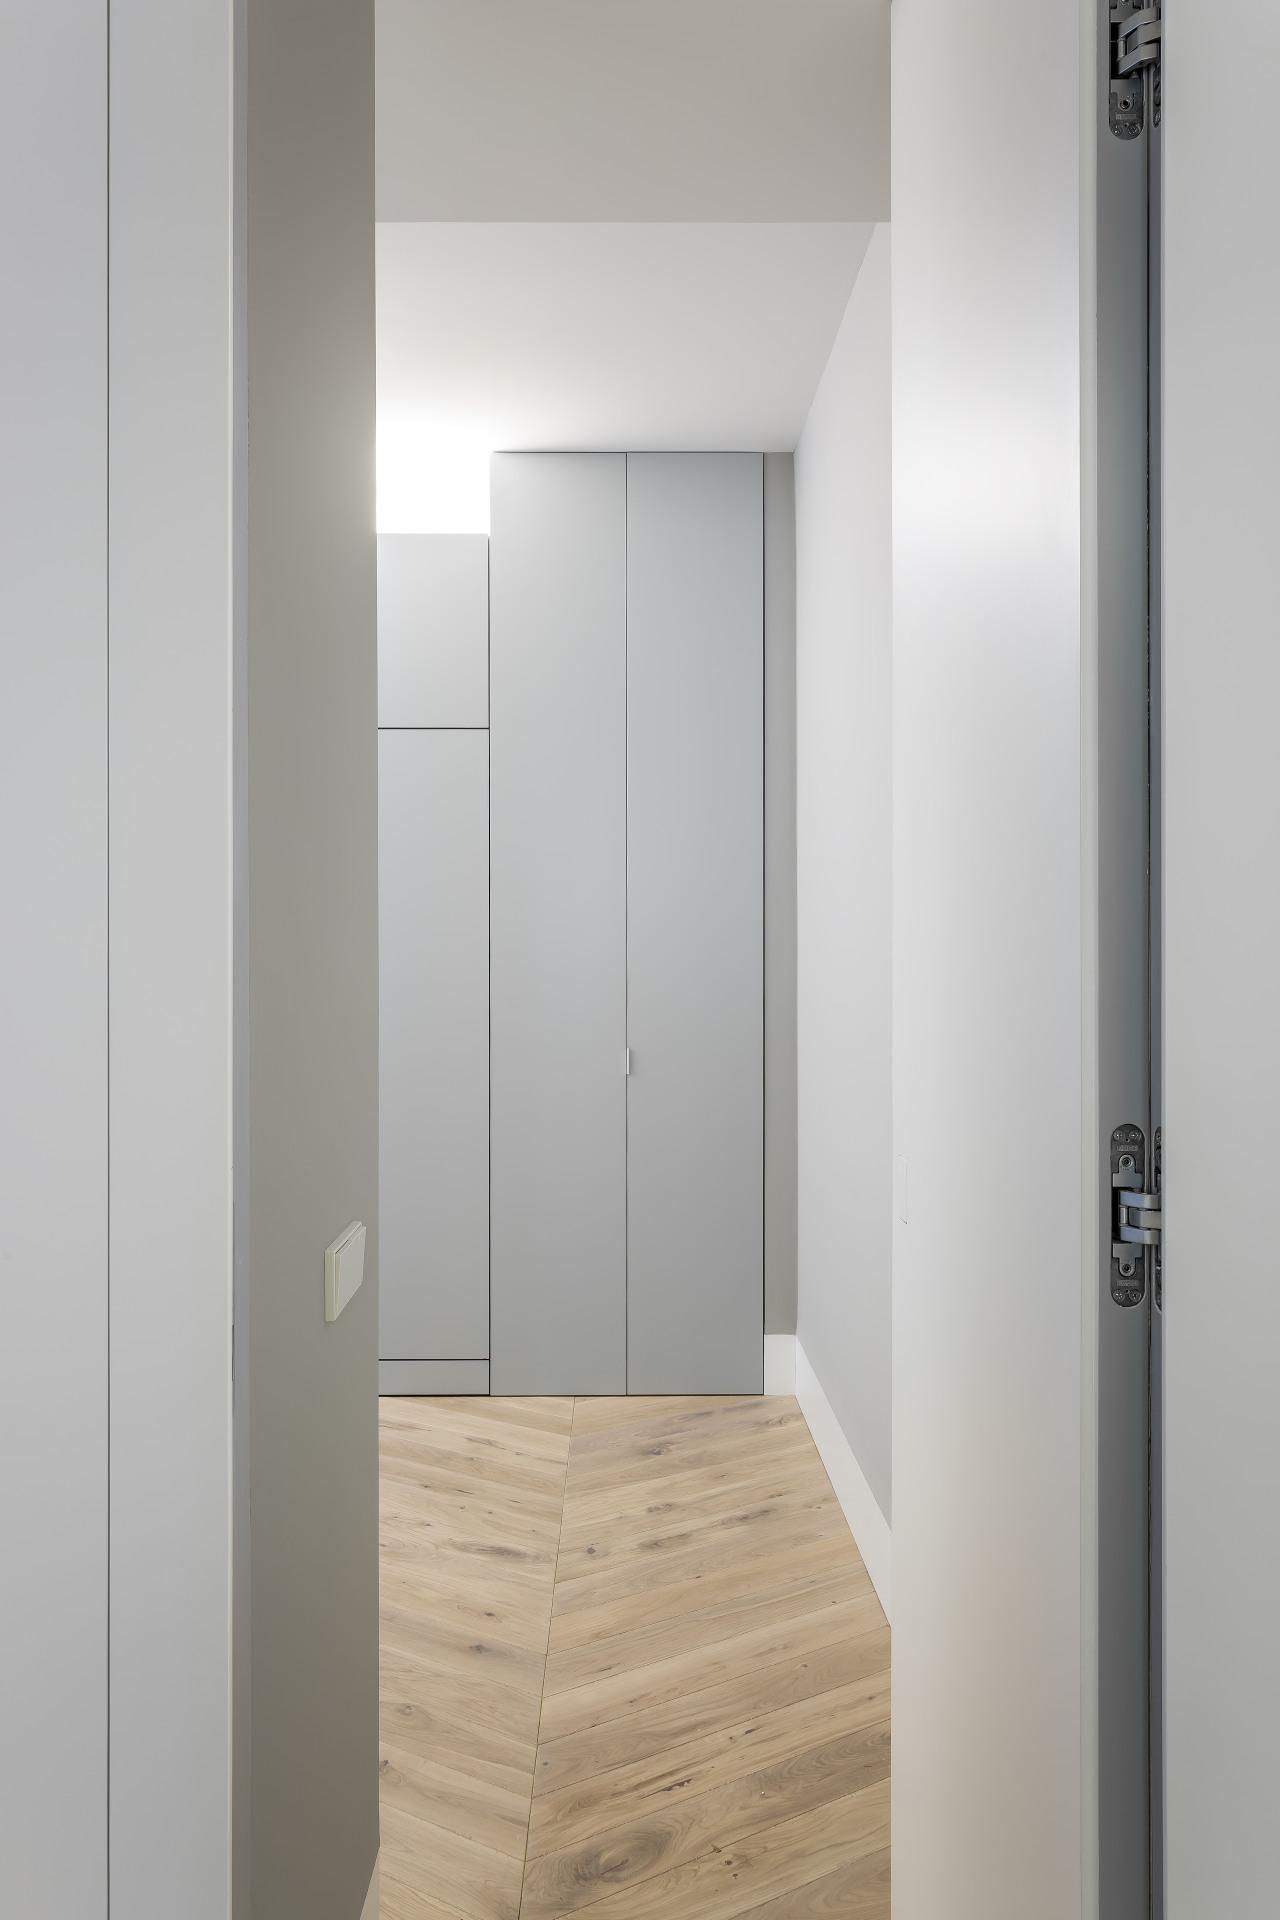 fotografia-arquitectura-valencia-german-cabo-gallardo-llopis-bfm-edificatoria-turia01 (4)